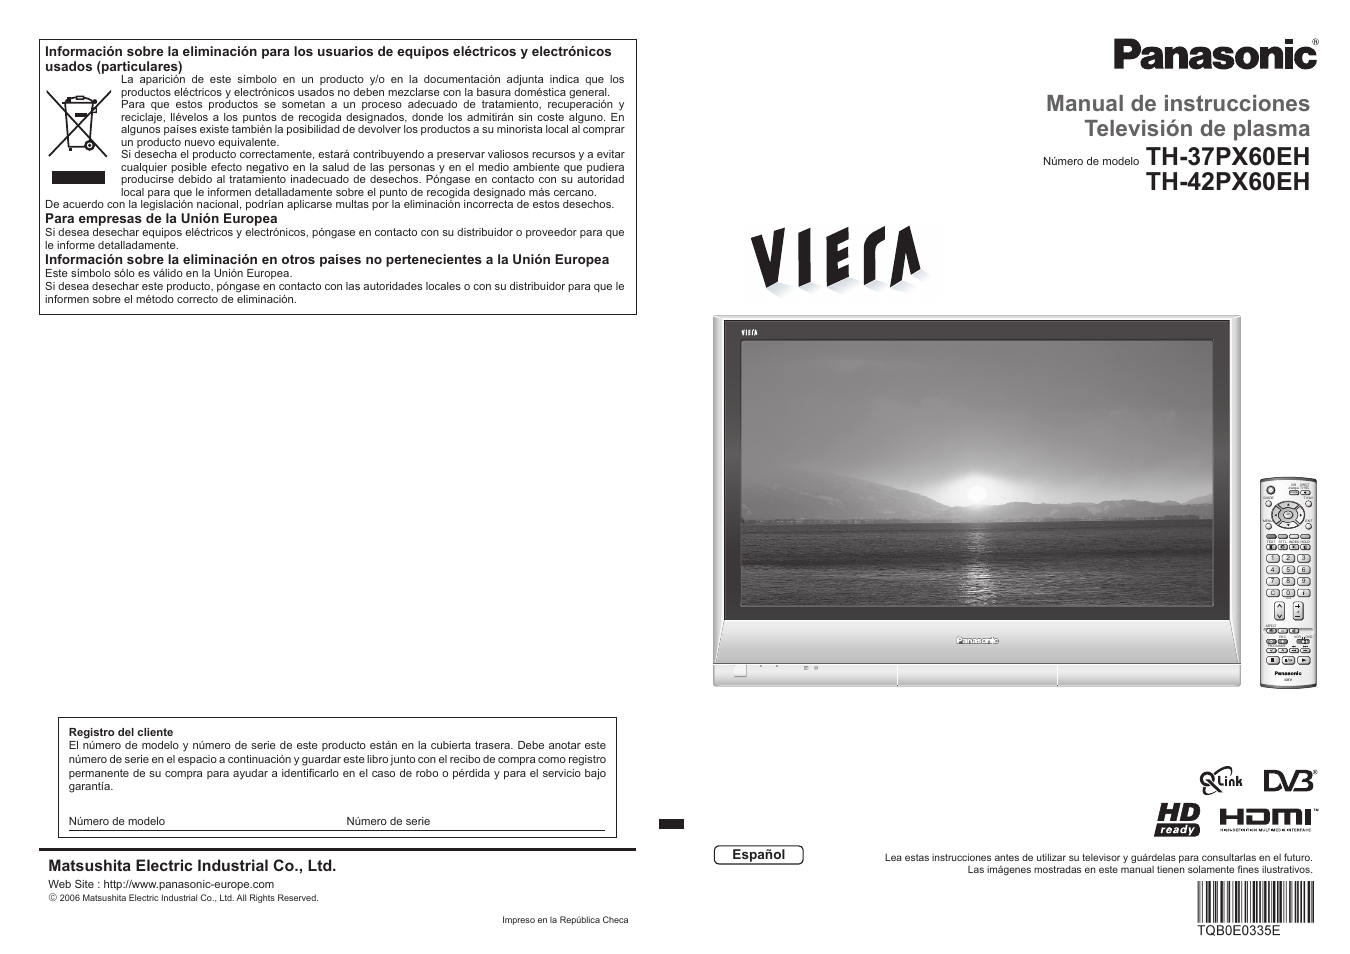 panasonic th37px60eh manual del usuario p ginas 20 rh pdfmanuales com Panasonic Viera Service Manual Panasonic Viera Manual PDF